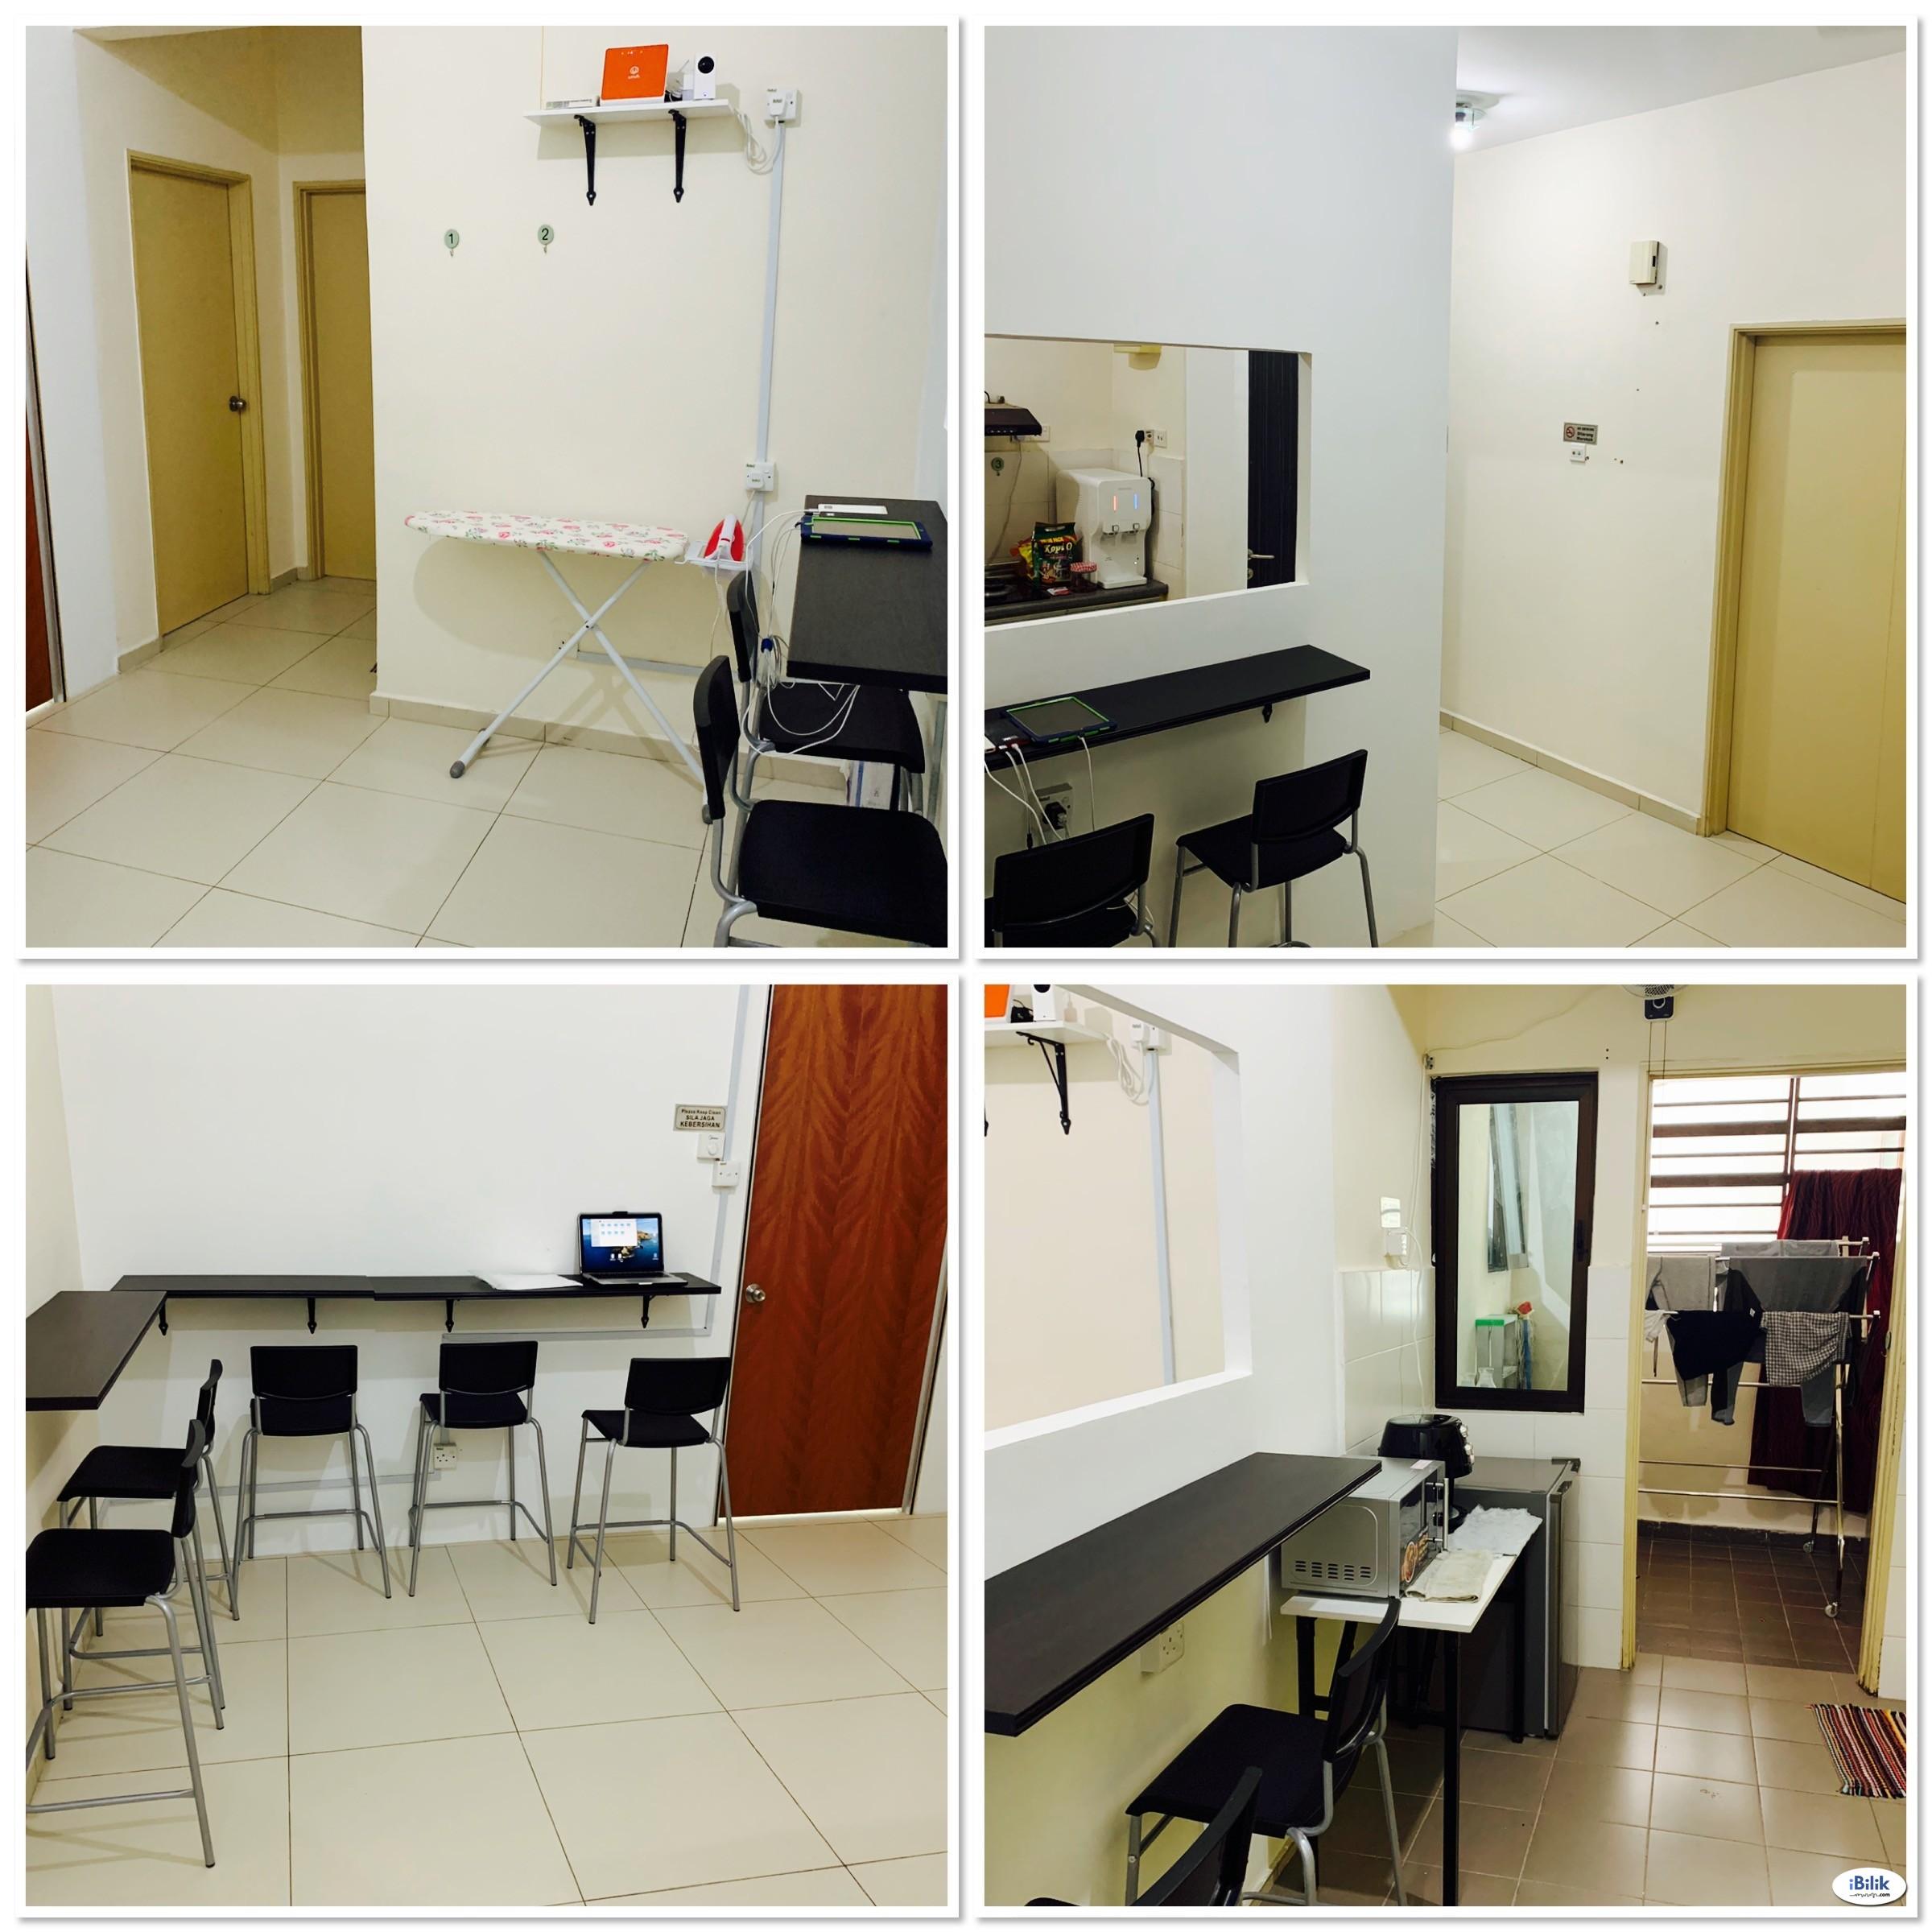 Middle Room at Serin Residency, Cyberjaya